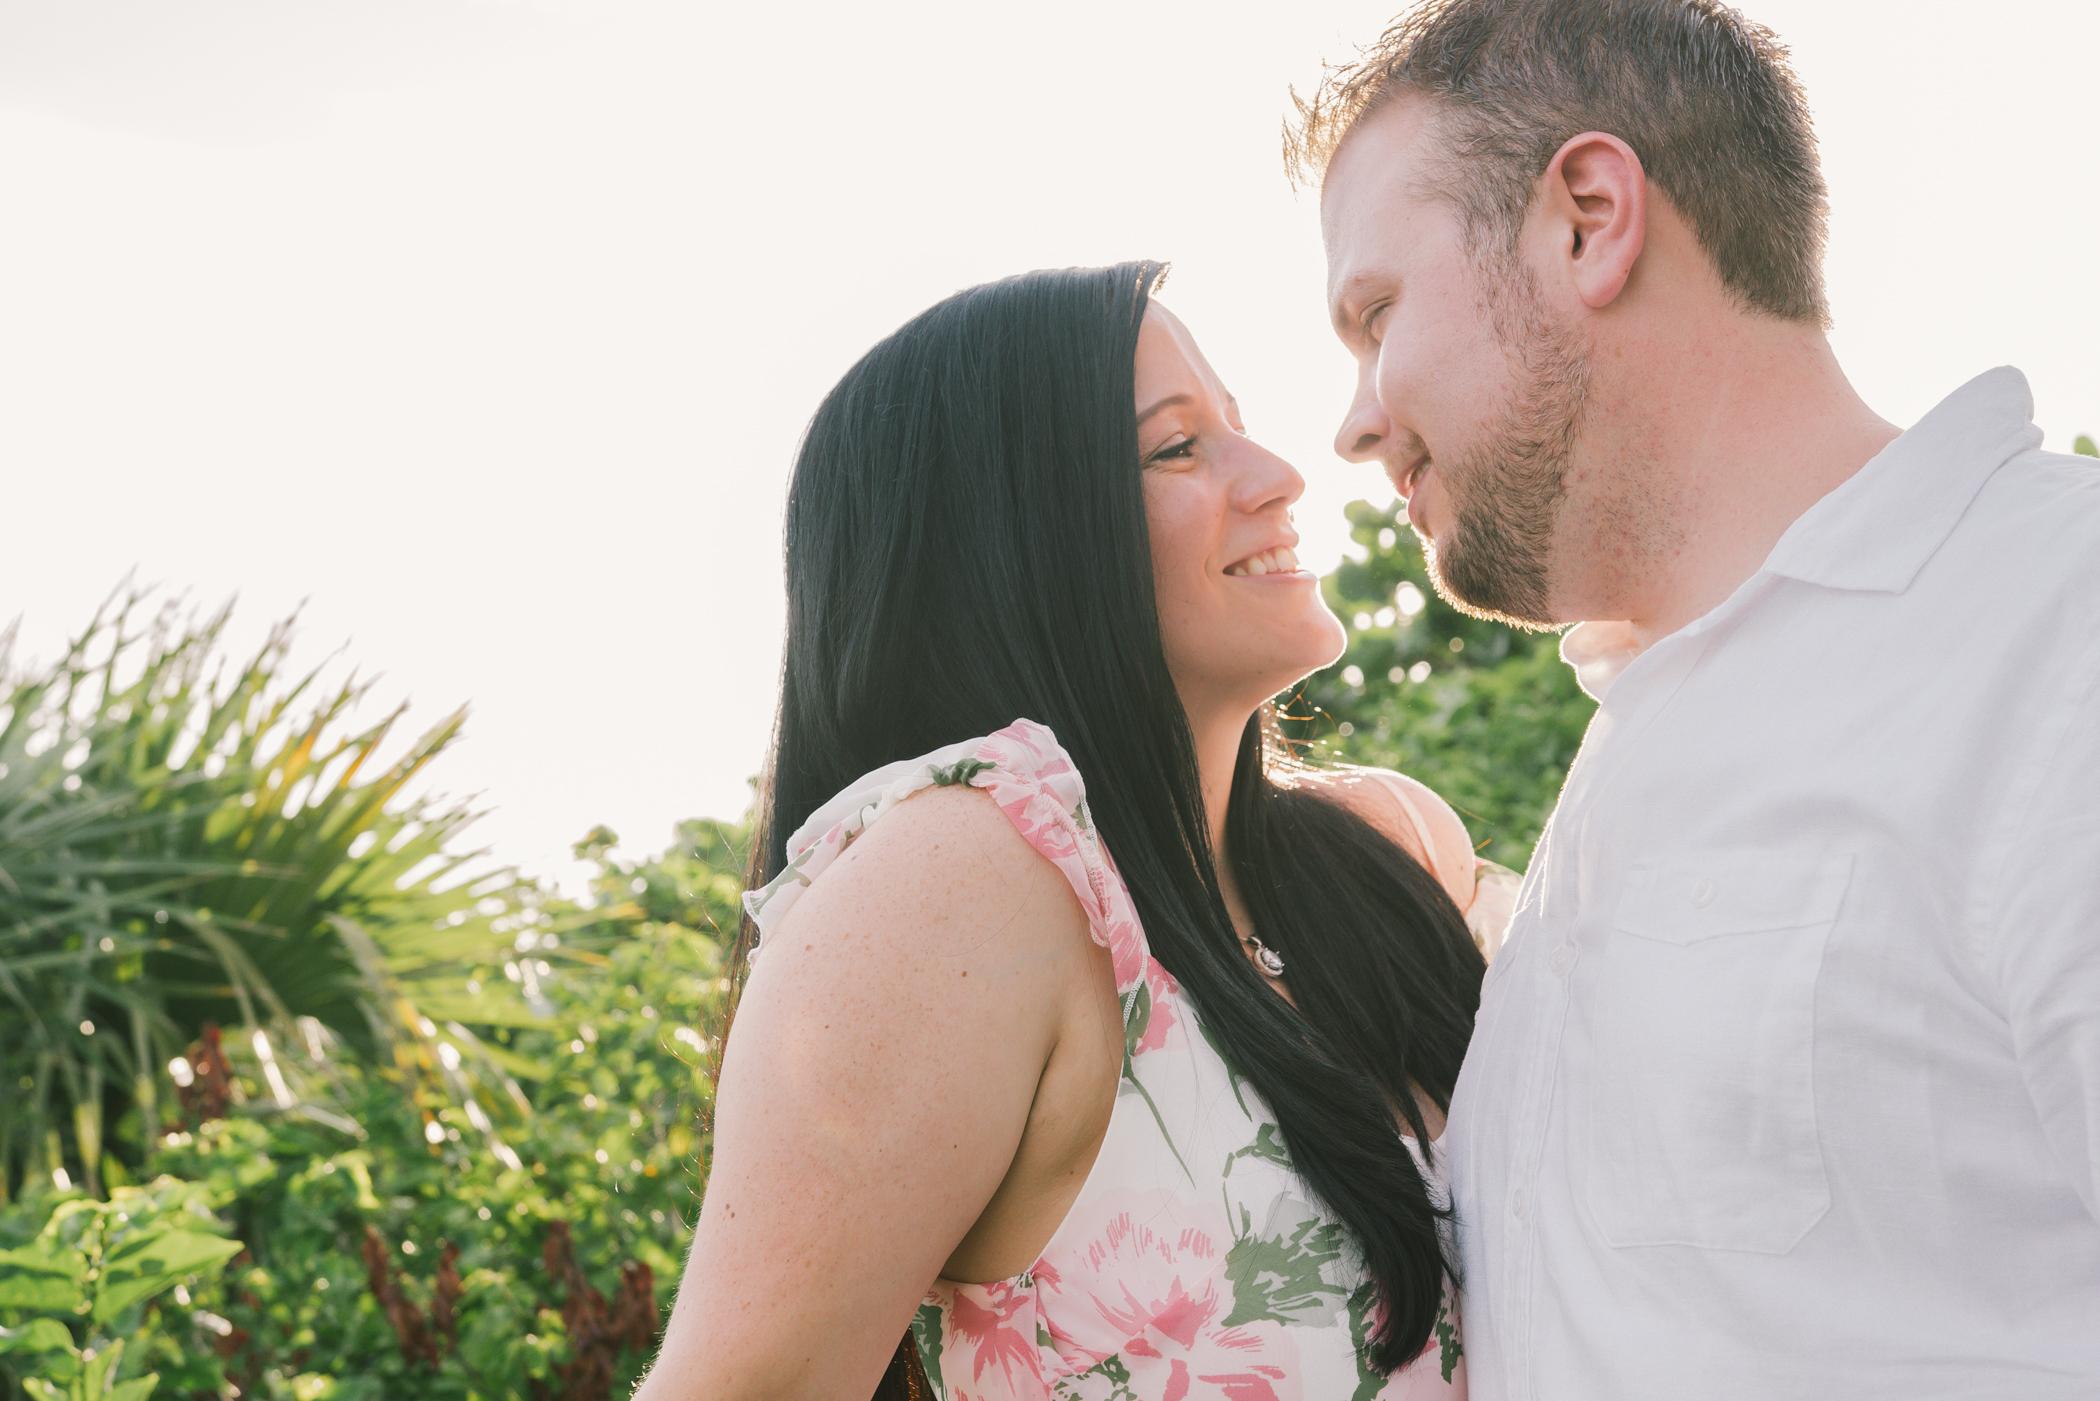 florida-beach-engagement-photoshoot, tampa-wedding-photographer